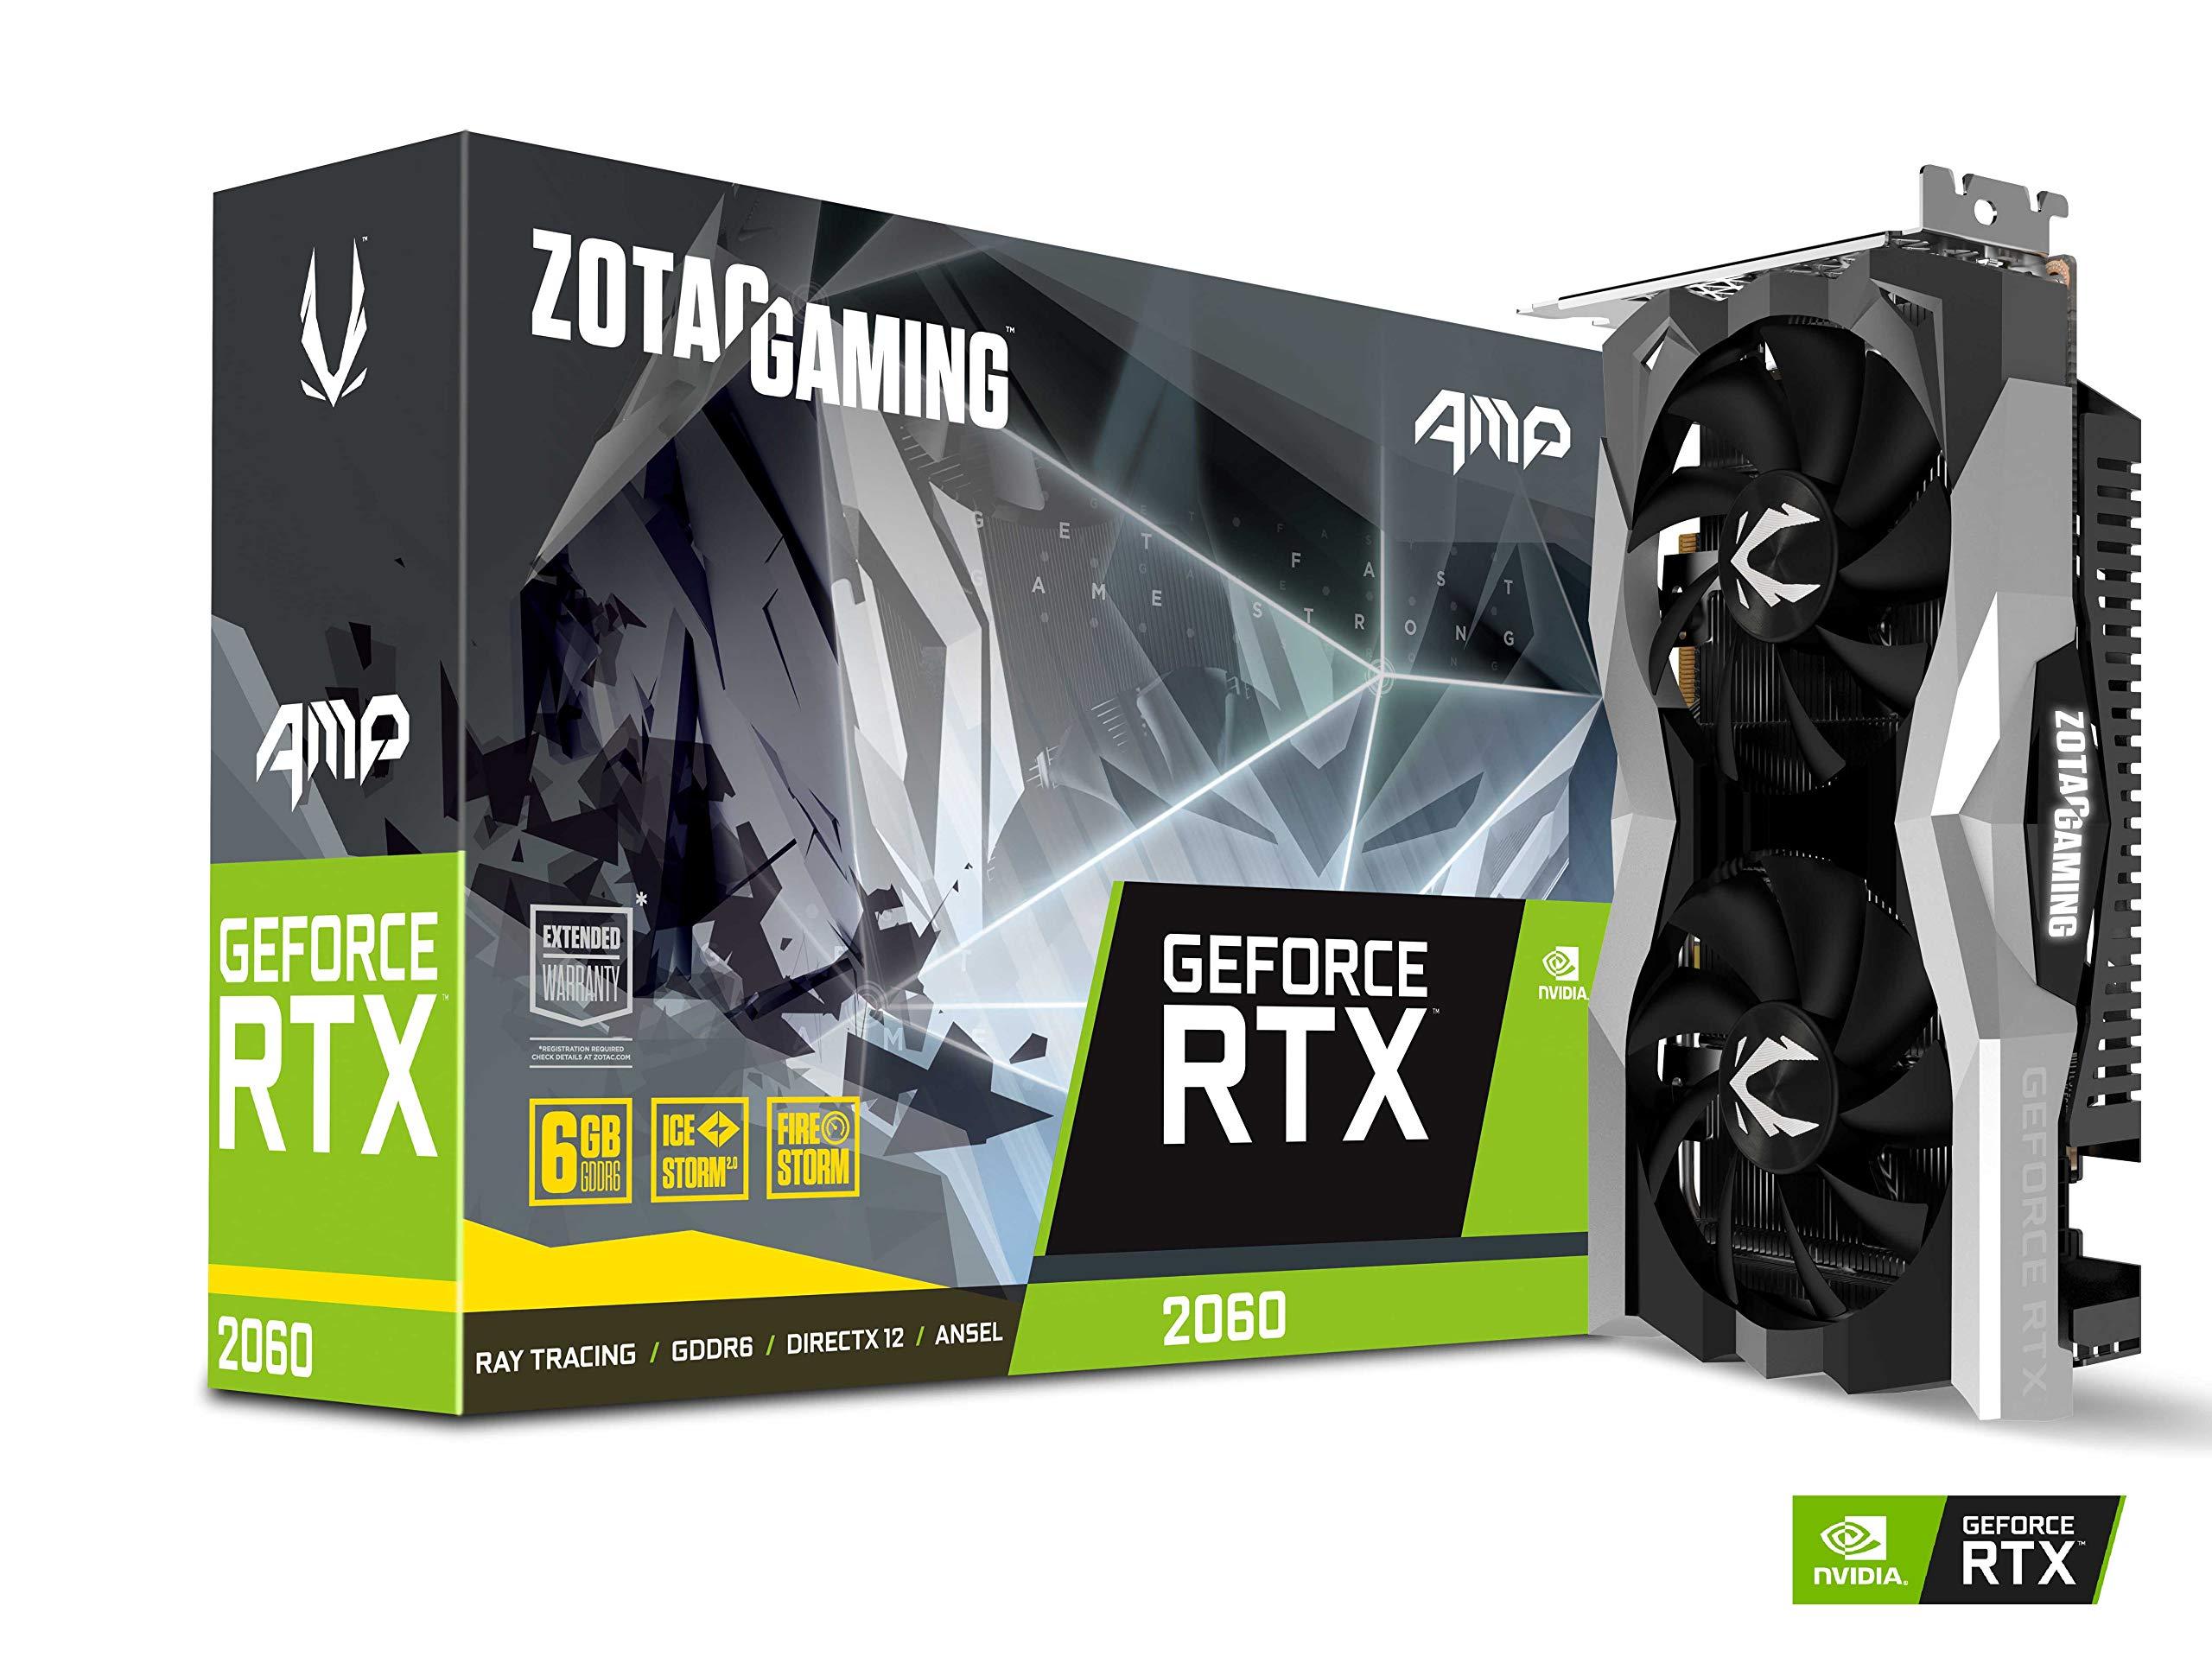 ZOTAC GAMING GeForce RTX 2060 AMP 6GB GDDR6 192-bit Gaming Graphics Card, Super Compact, IceStorm 2.0, ZT-T20600D-10M by ZOTAC